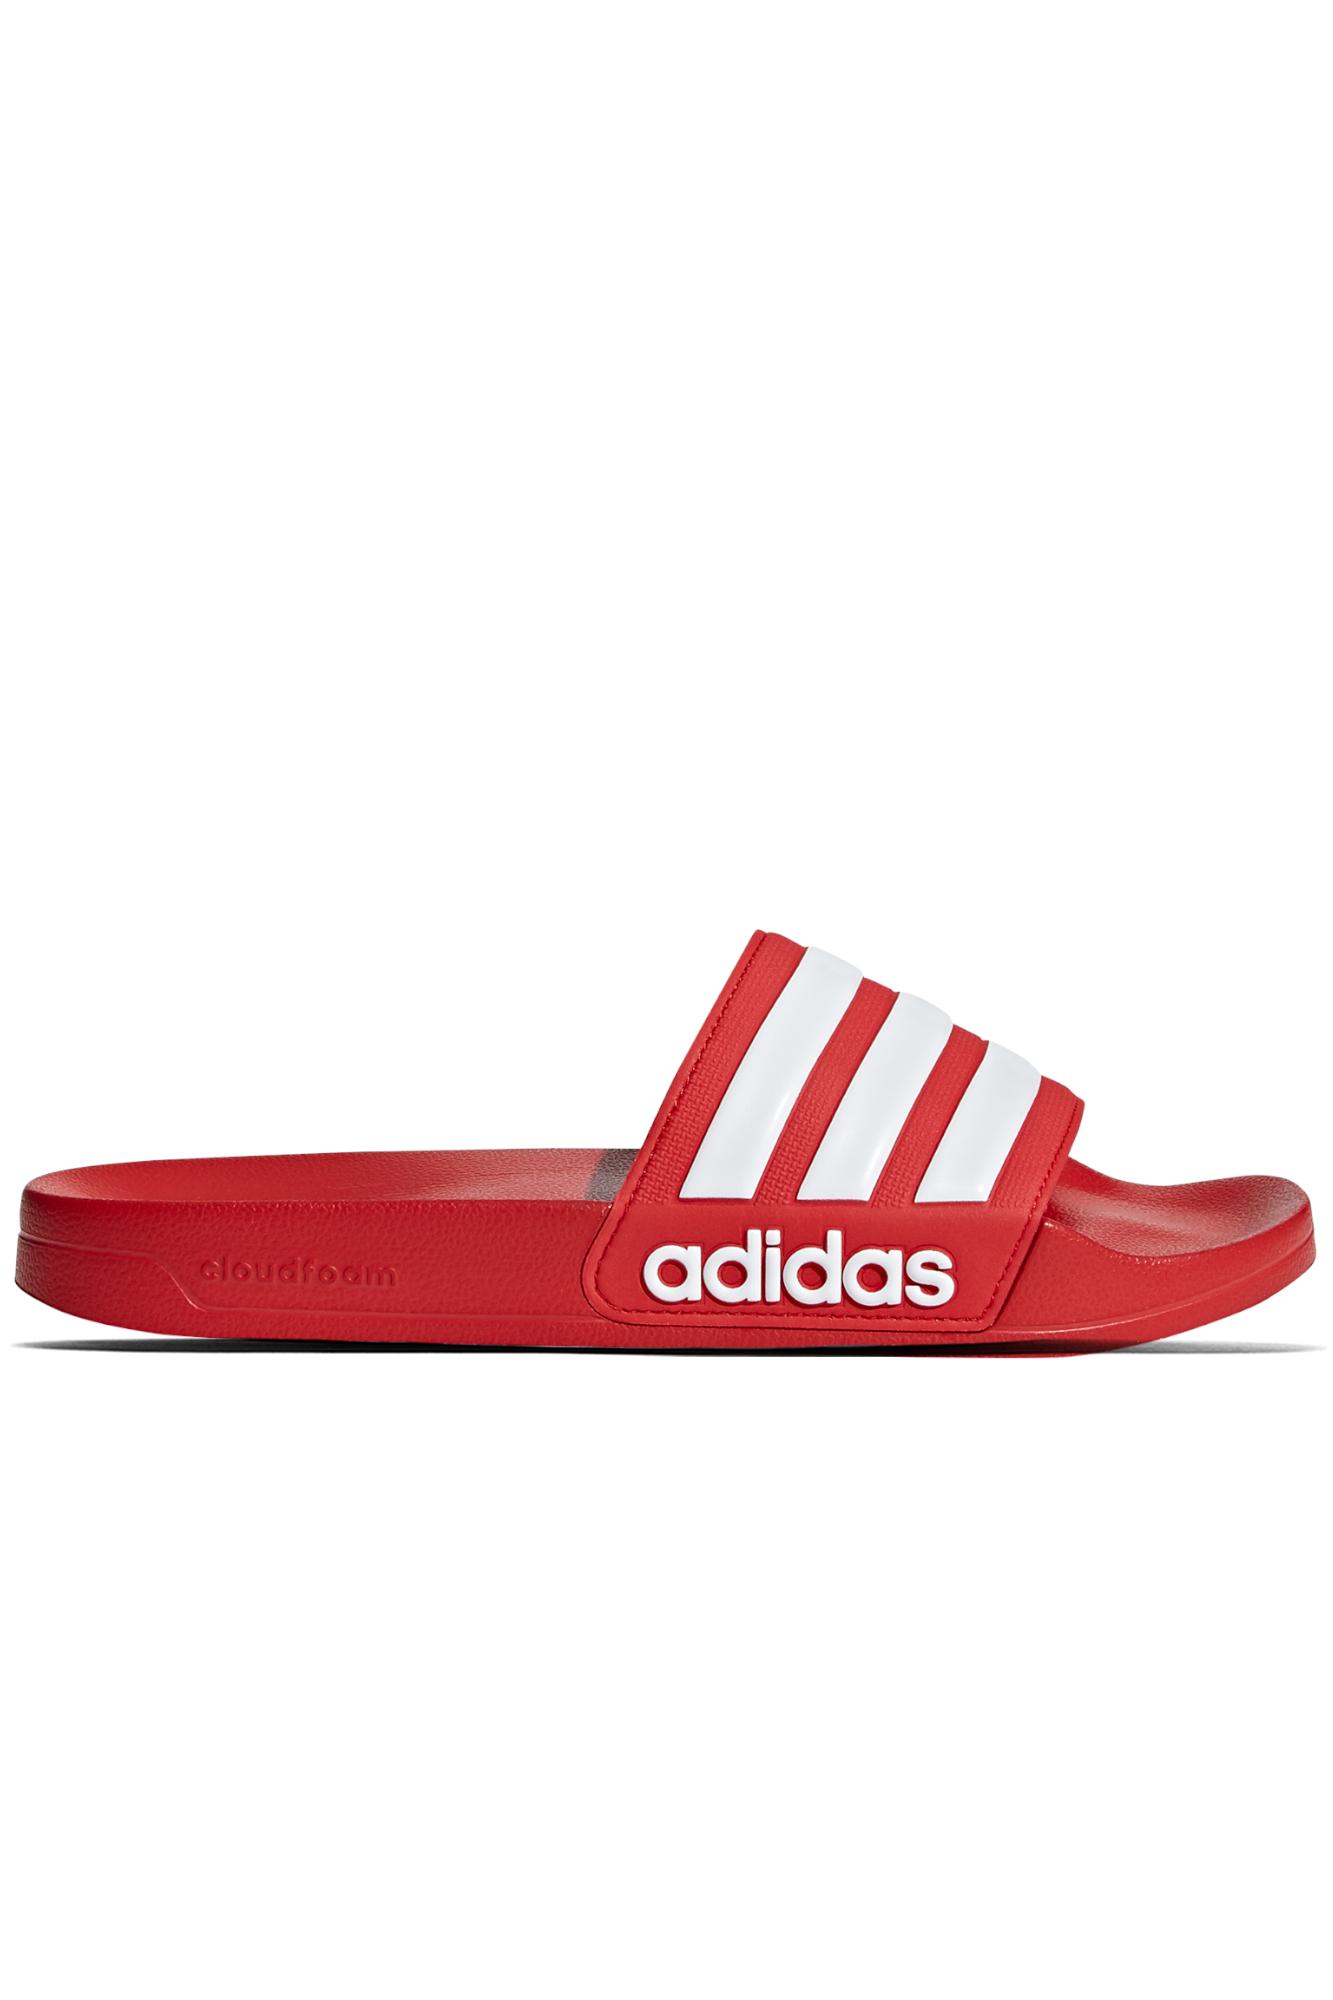 urban games klapki adidas